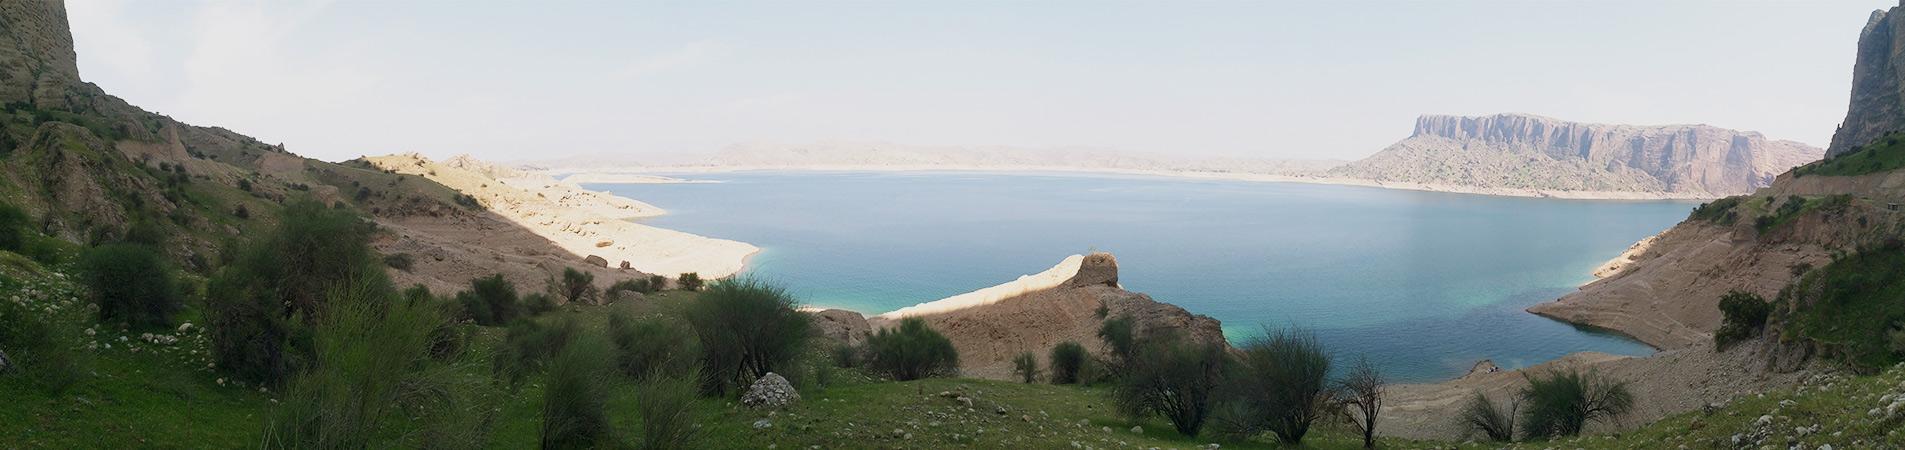 دریاچه شهیون ؛ مروارید دزفول